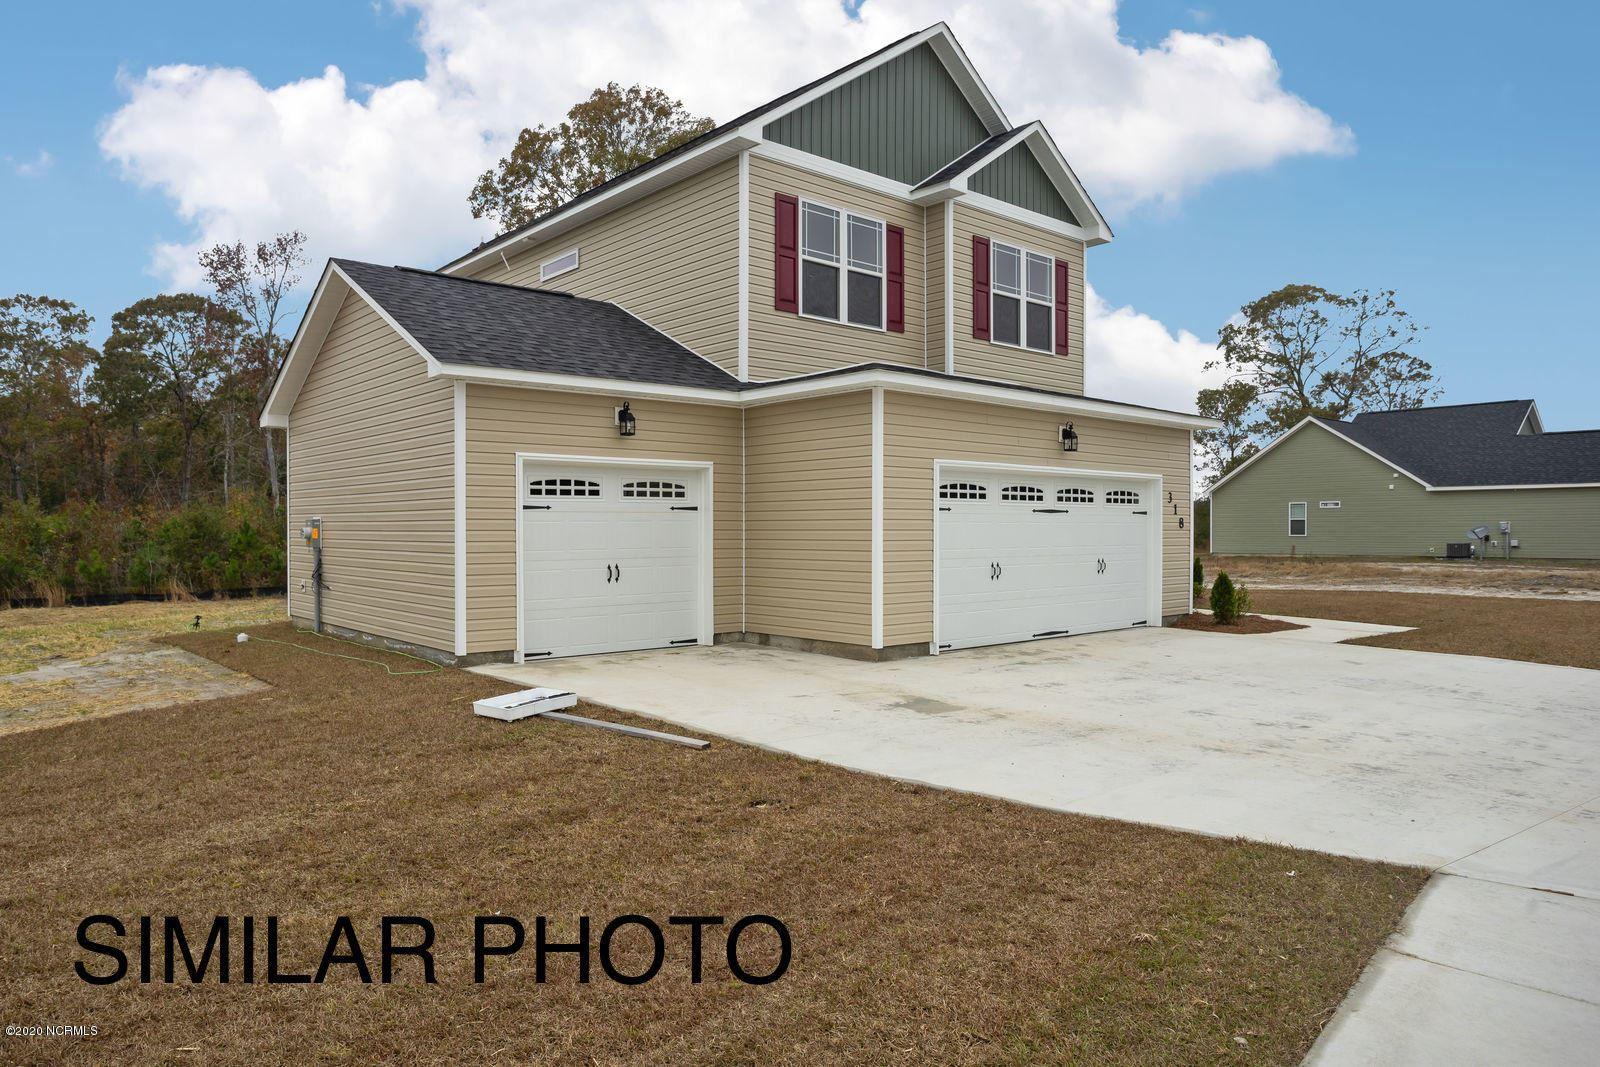 Photo of 820 Wheatmill Lane, Jacksonville, NC 28546 (MLS # 100252193)